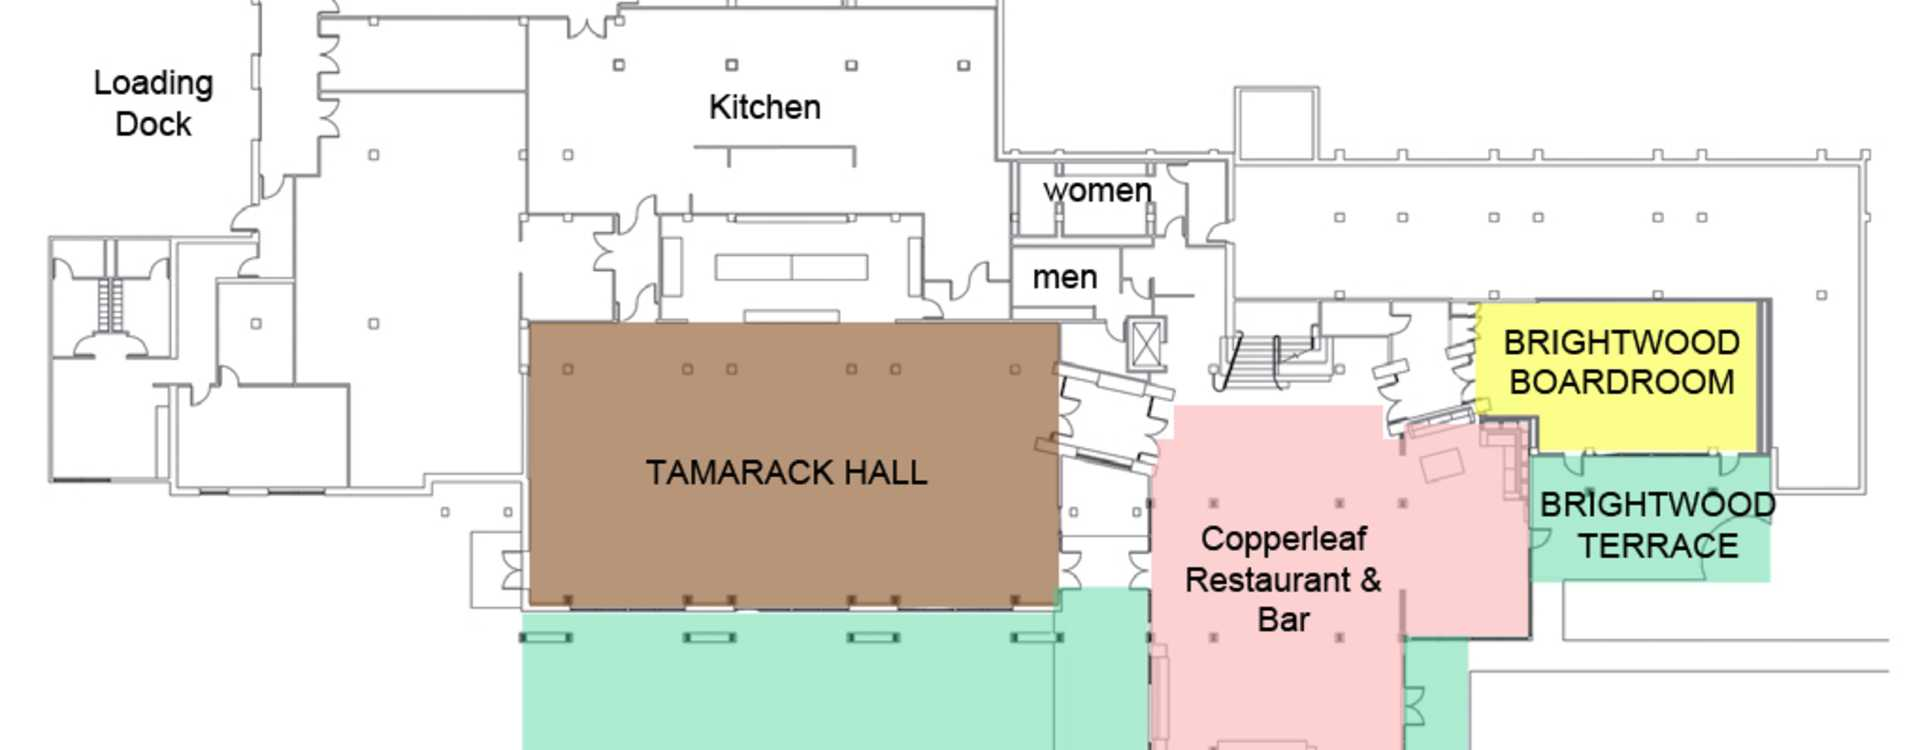 meeting-facility-Cedarbrook_Lodge_Meeting_Facility-6.jpg